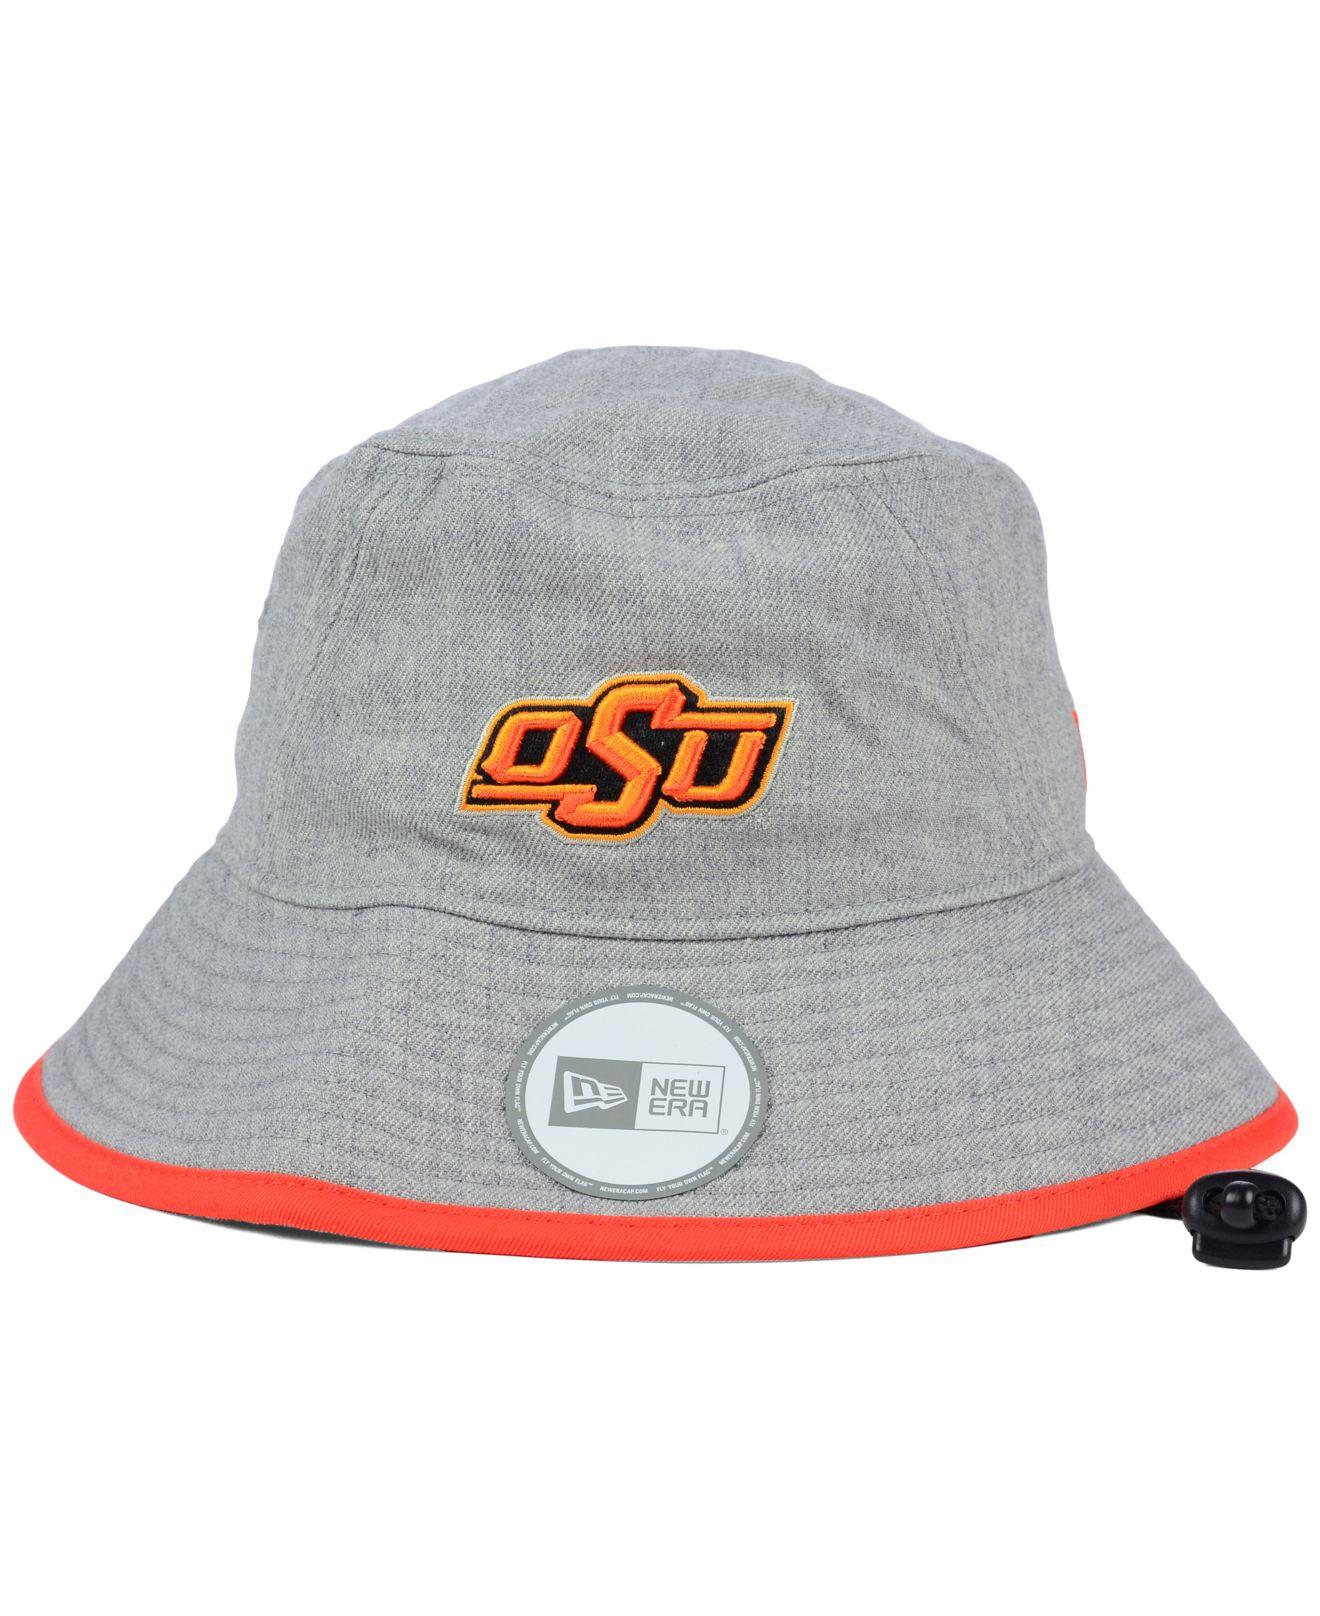 Lyst - KTZ Oklahoma State Cowboys Tip Bucket Hat in Gray c1036937ec8